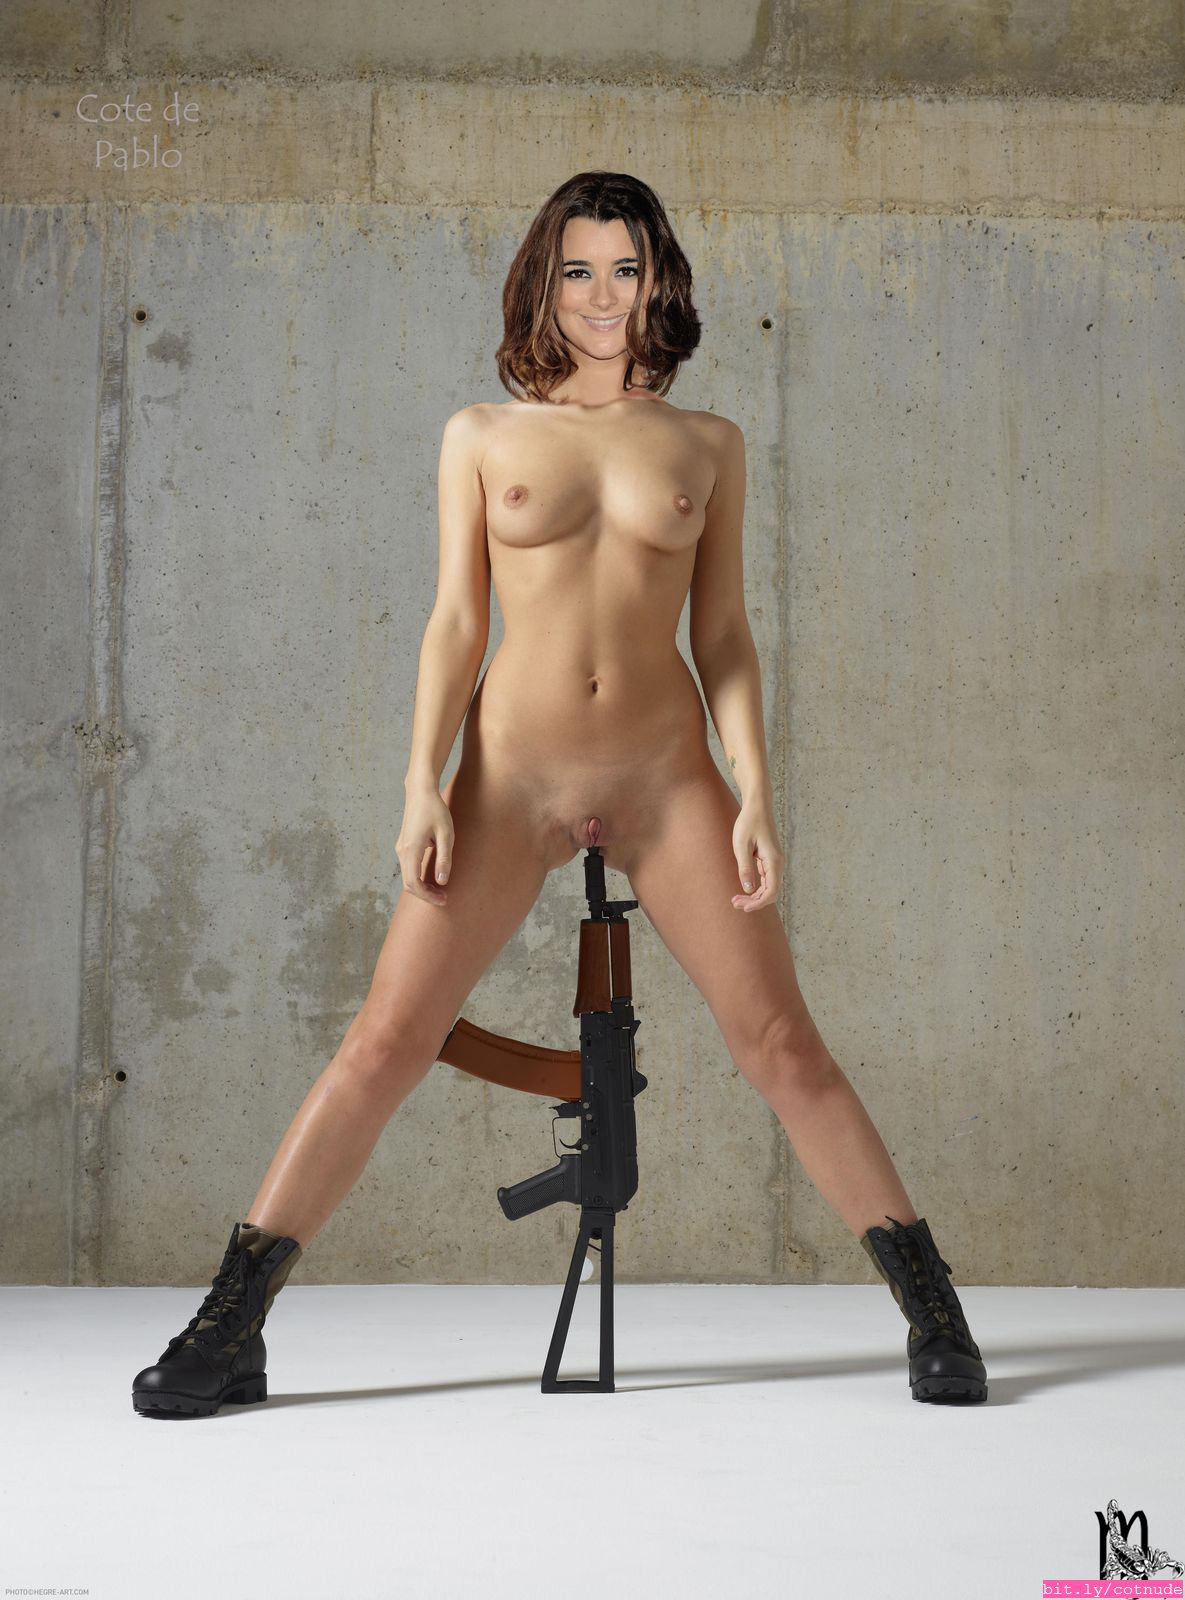 Ncis Porno sexy nude ncis porn sex nude celeb | free download nude